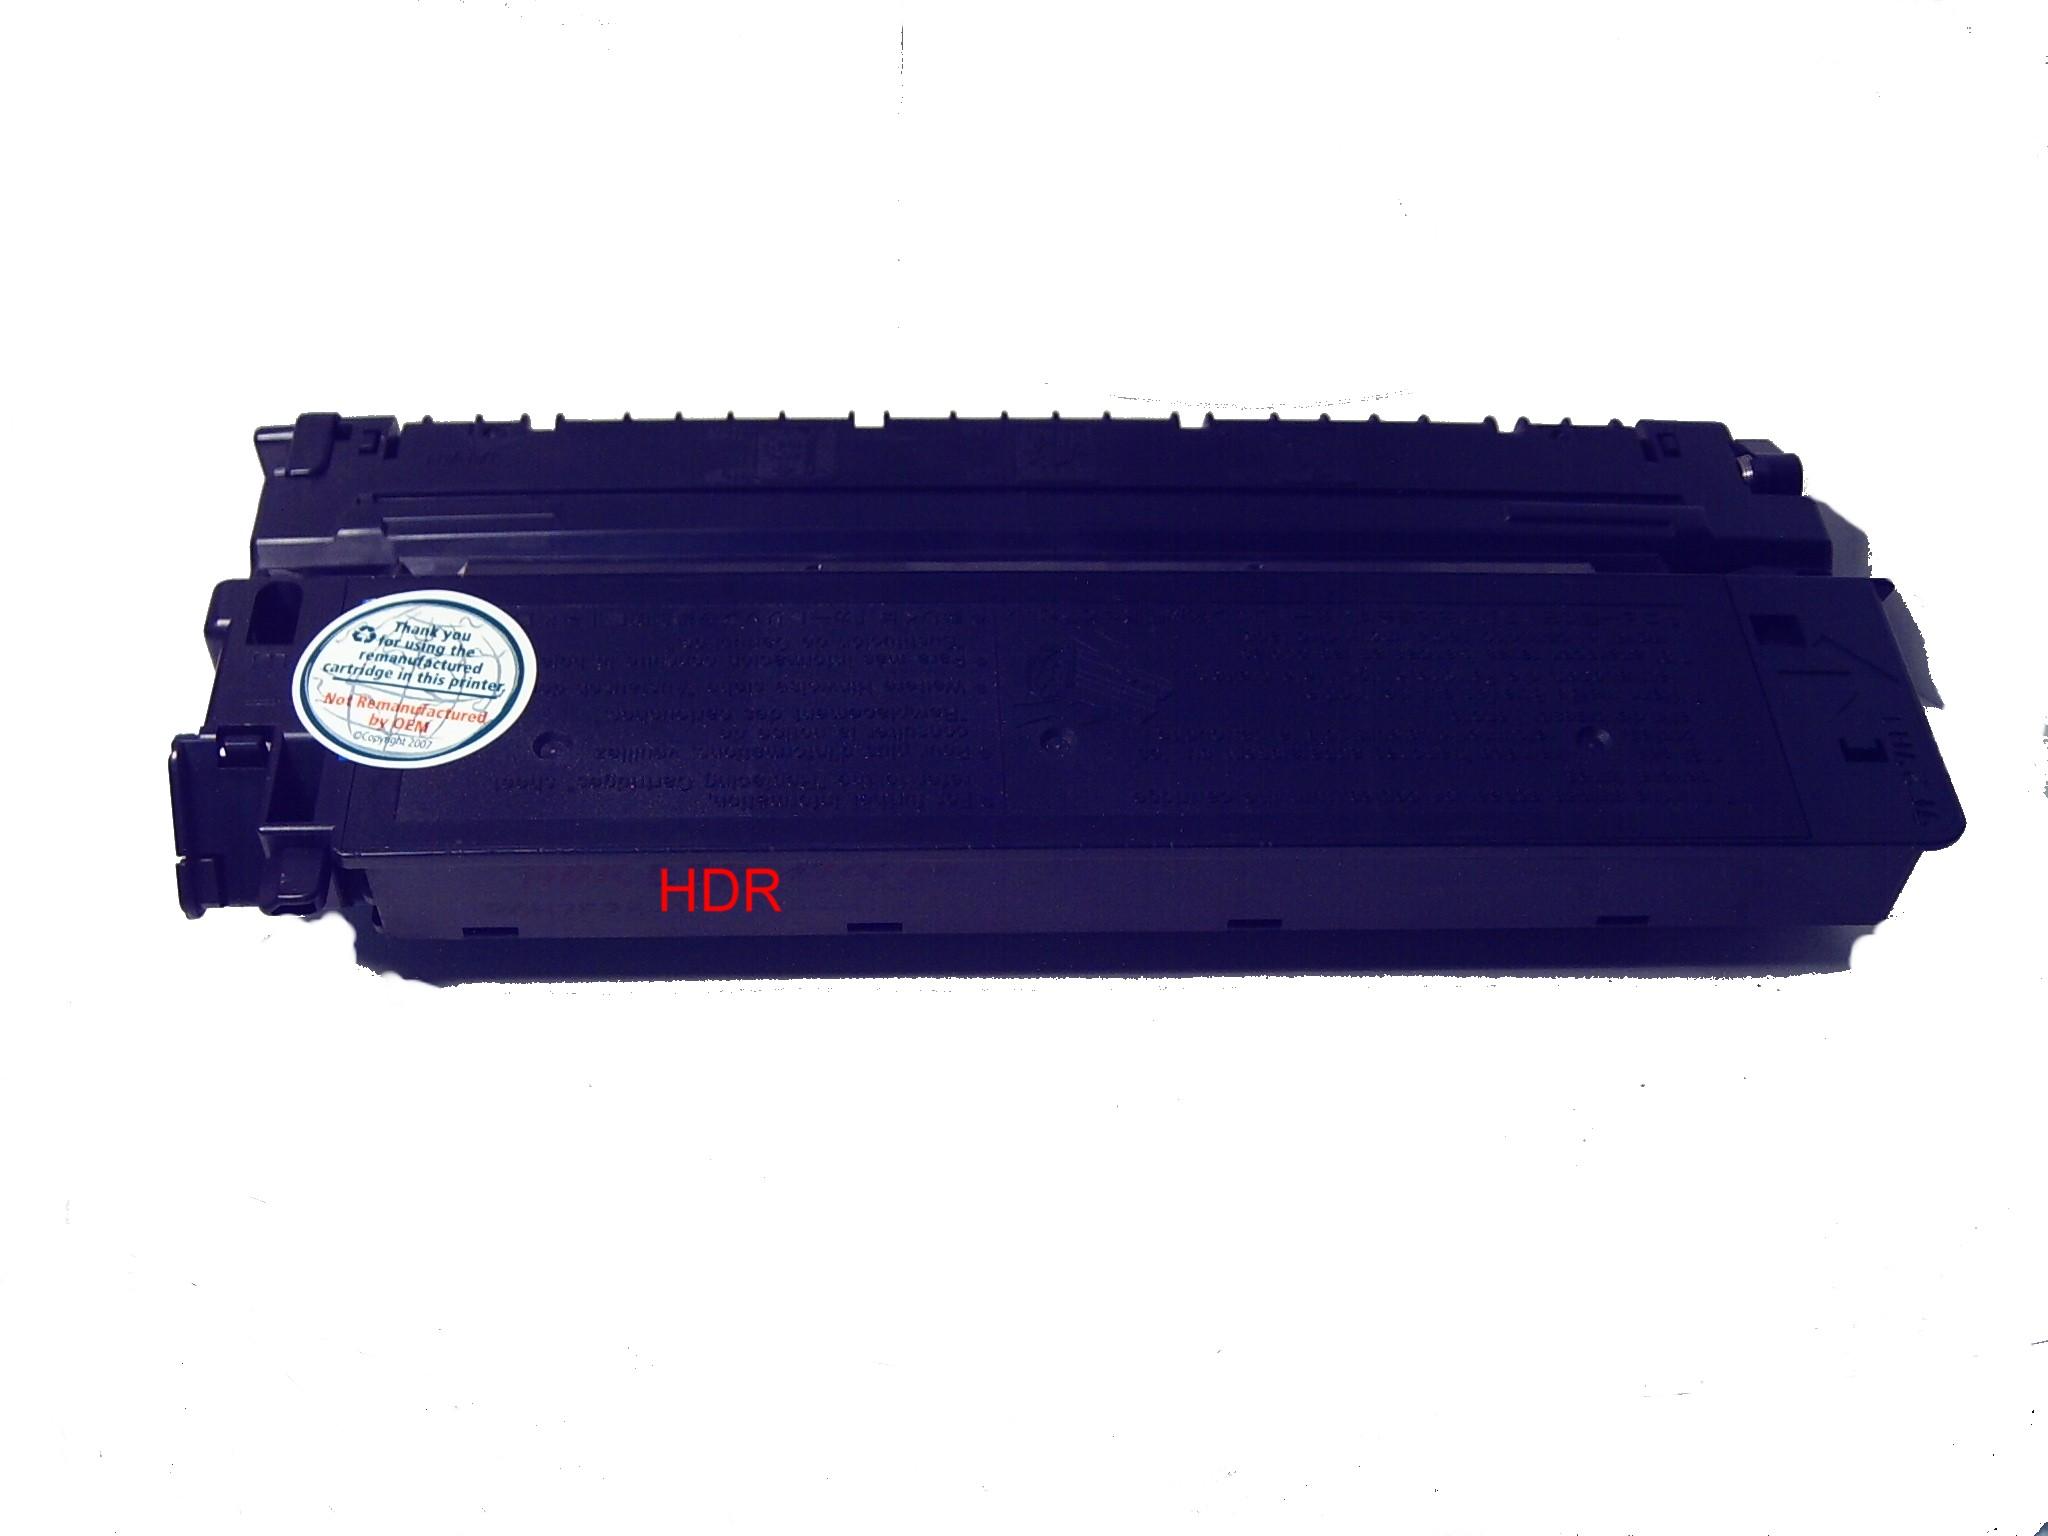 123soforkaufde Tinte Toner Patronen Canon 740 Kartusche Kompatibel Zu E 30 Passend F Pc 710